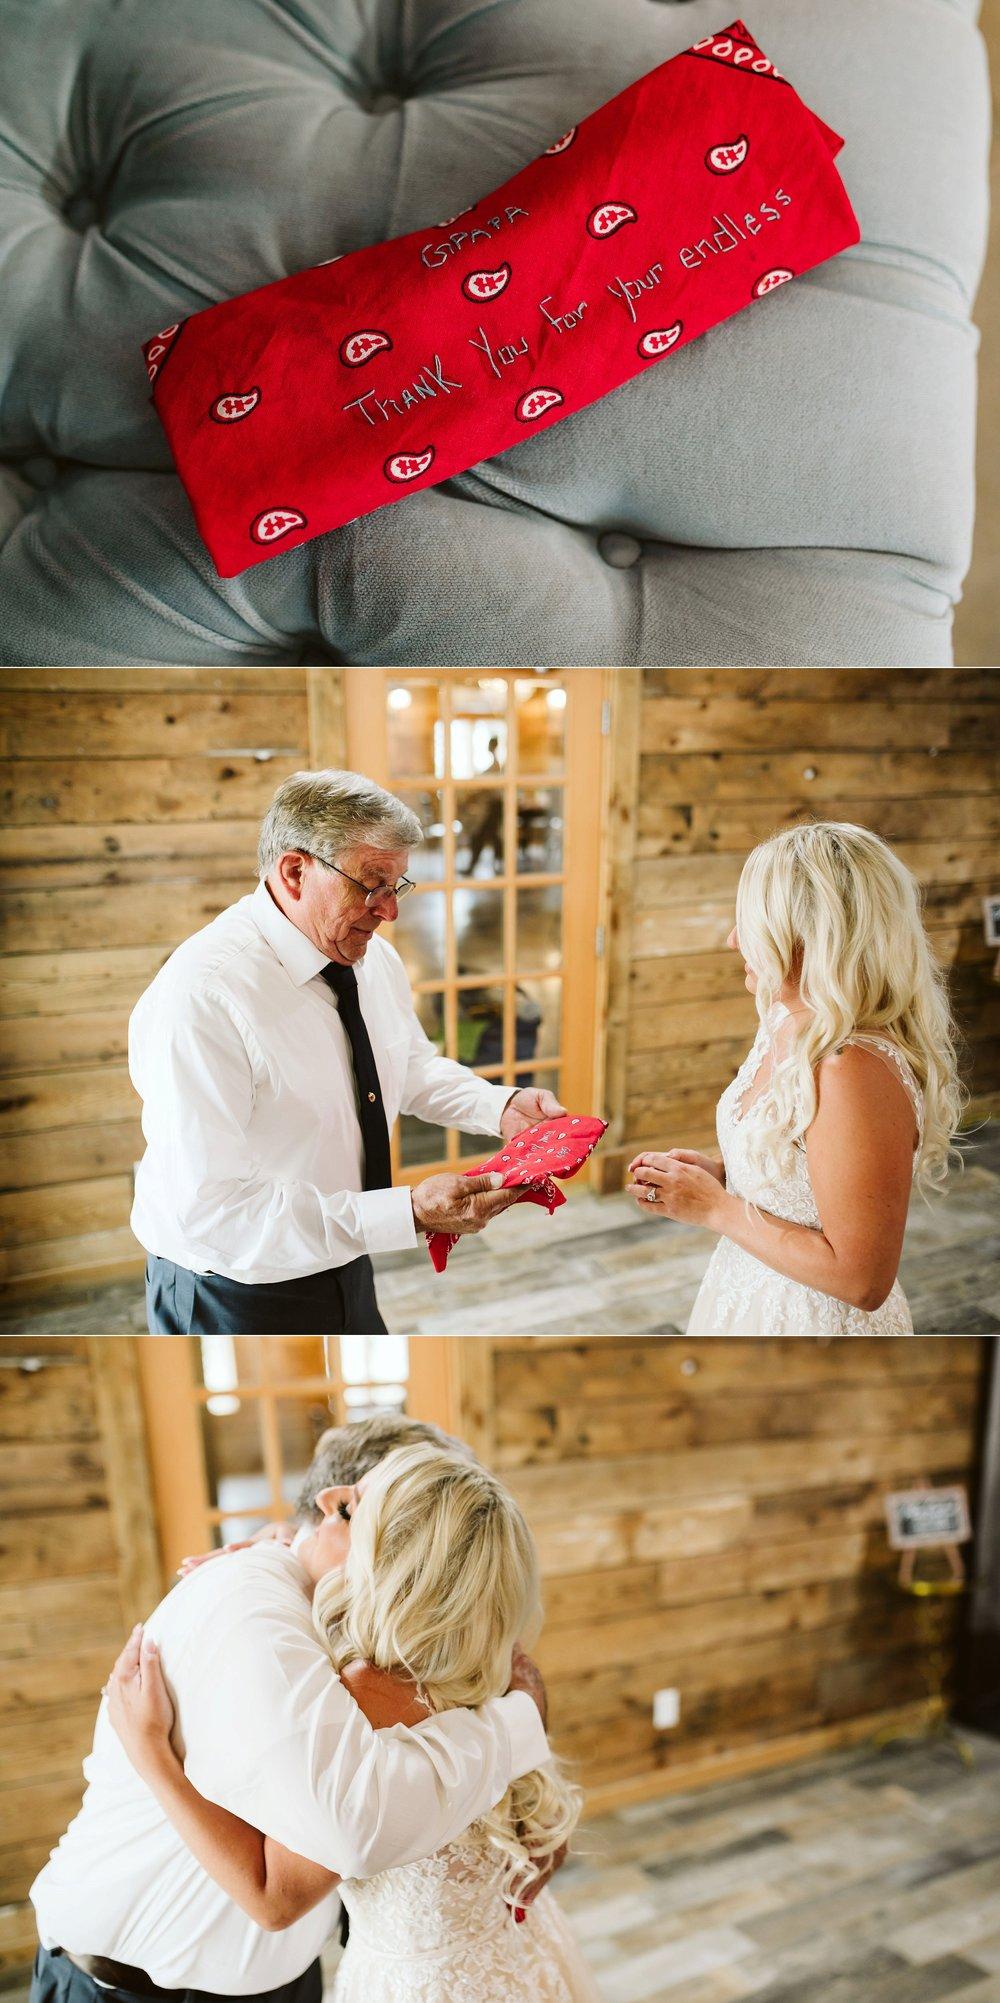 john-p-furber-farm-wedding-in-september-blush-and-floral-48.jpg